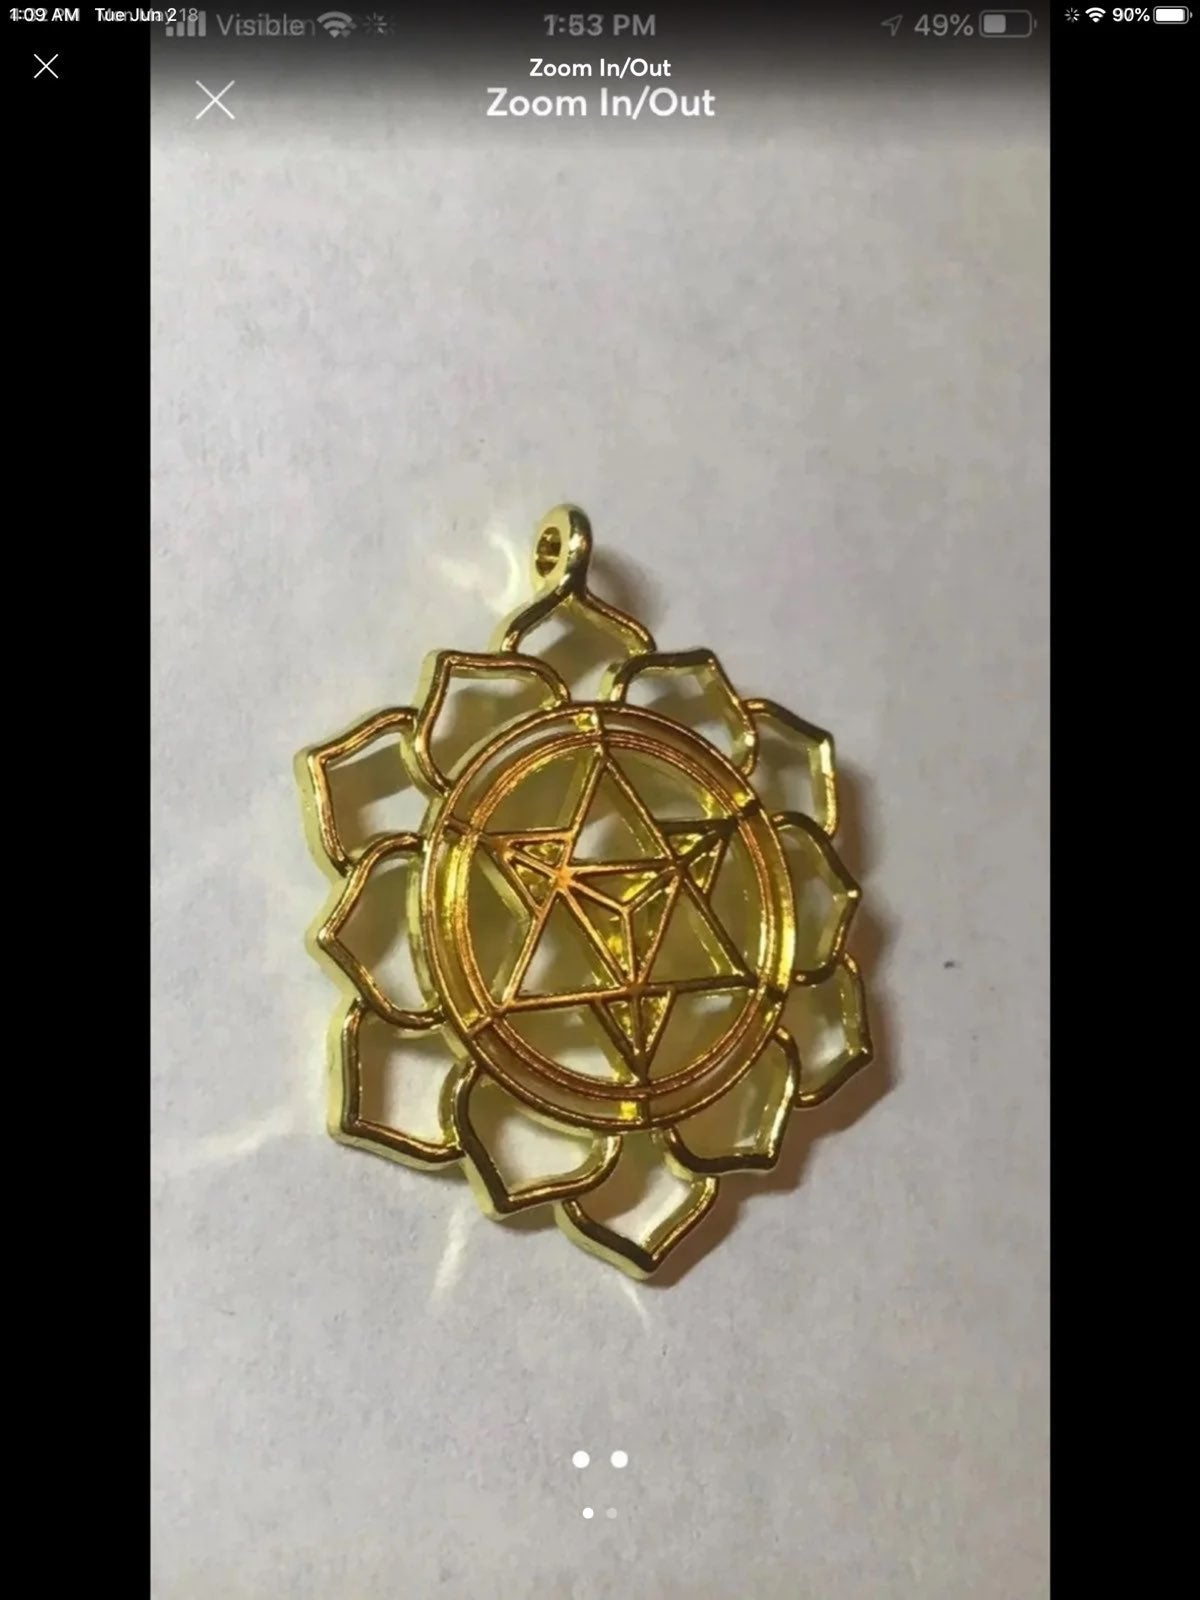 Metatron's cube Merkaba pendant